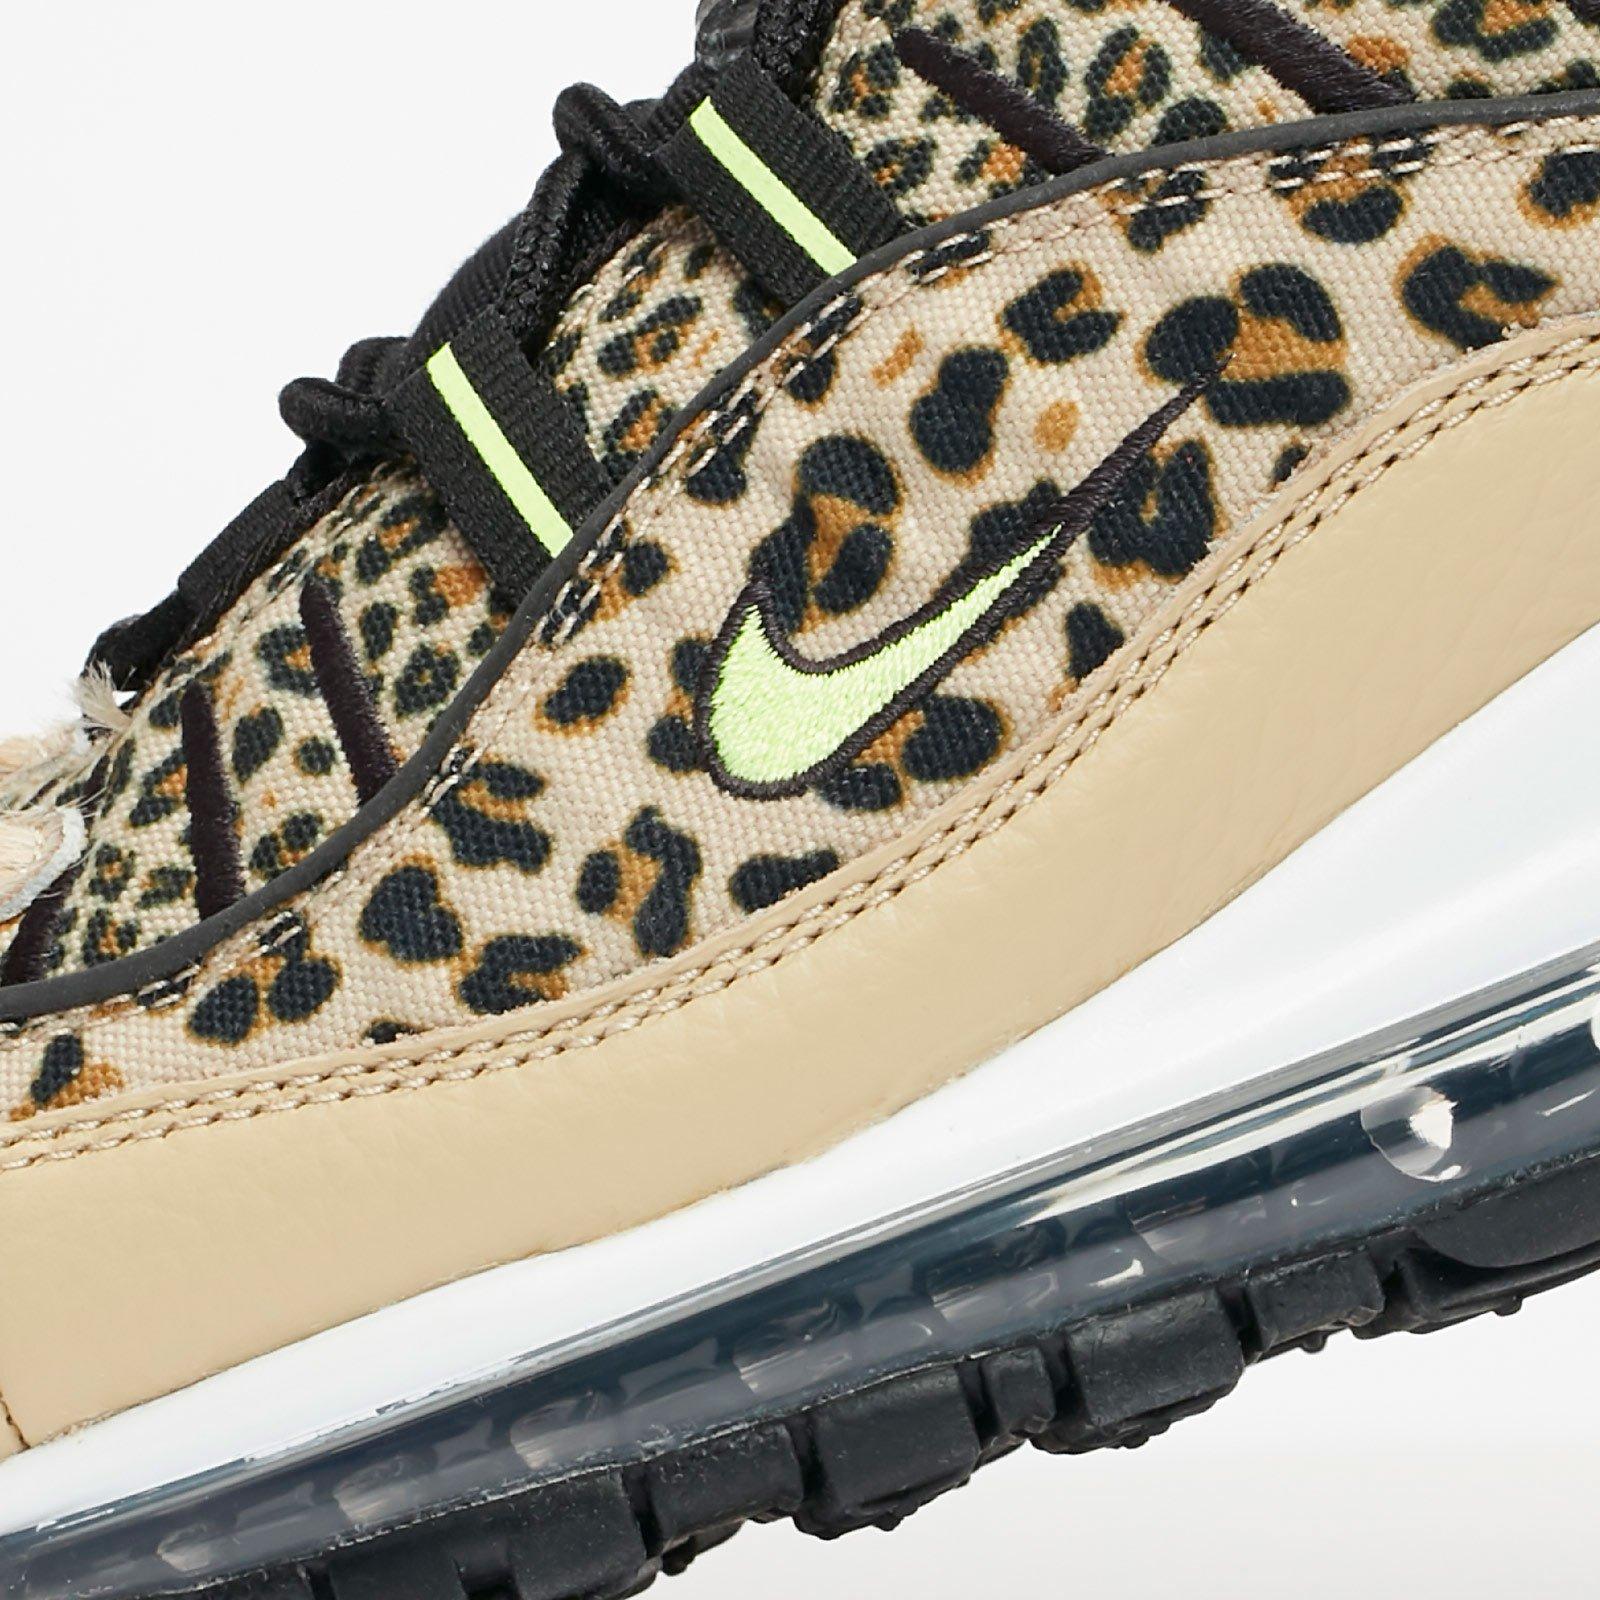 Nike Wmns Air Max 98 Premium Bv1978 200 Sneakersnstuff